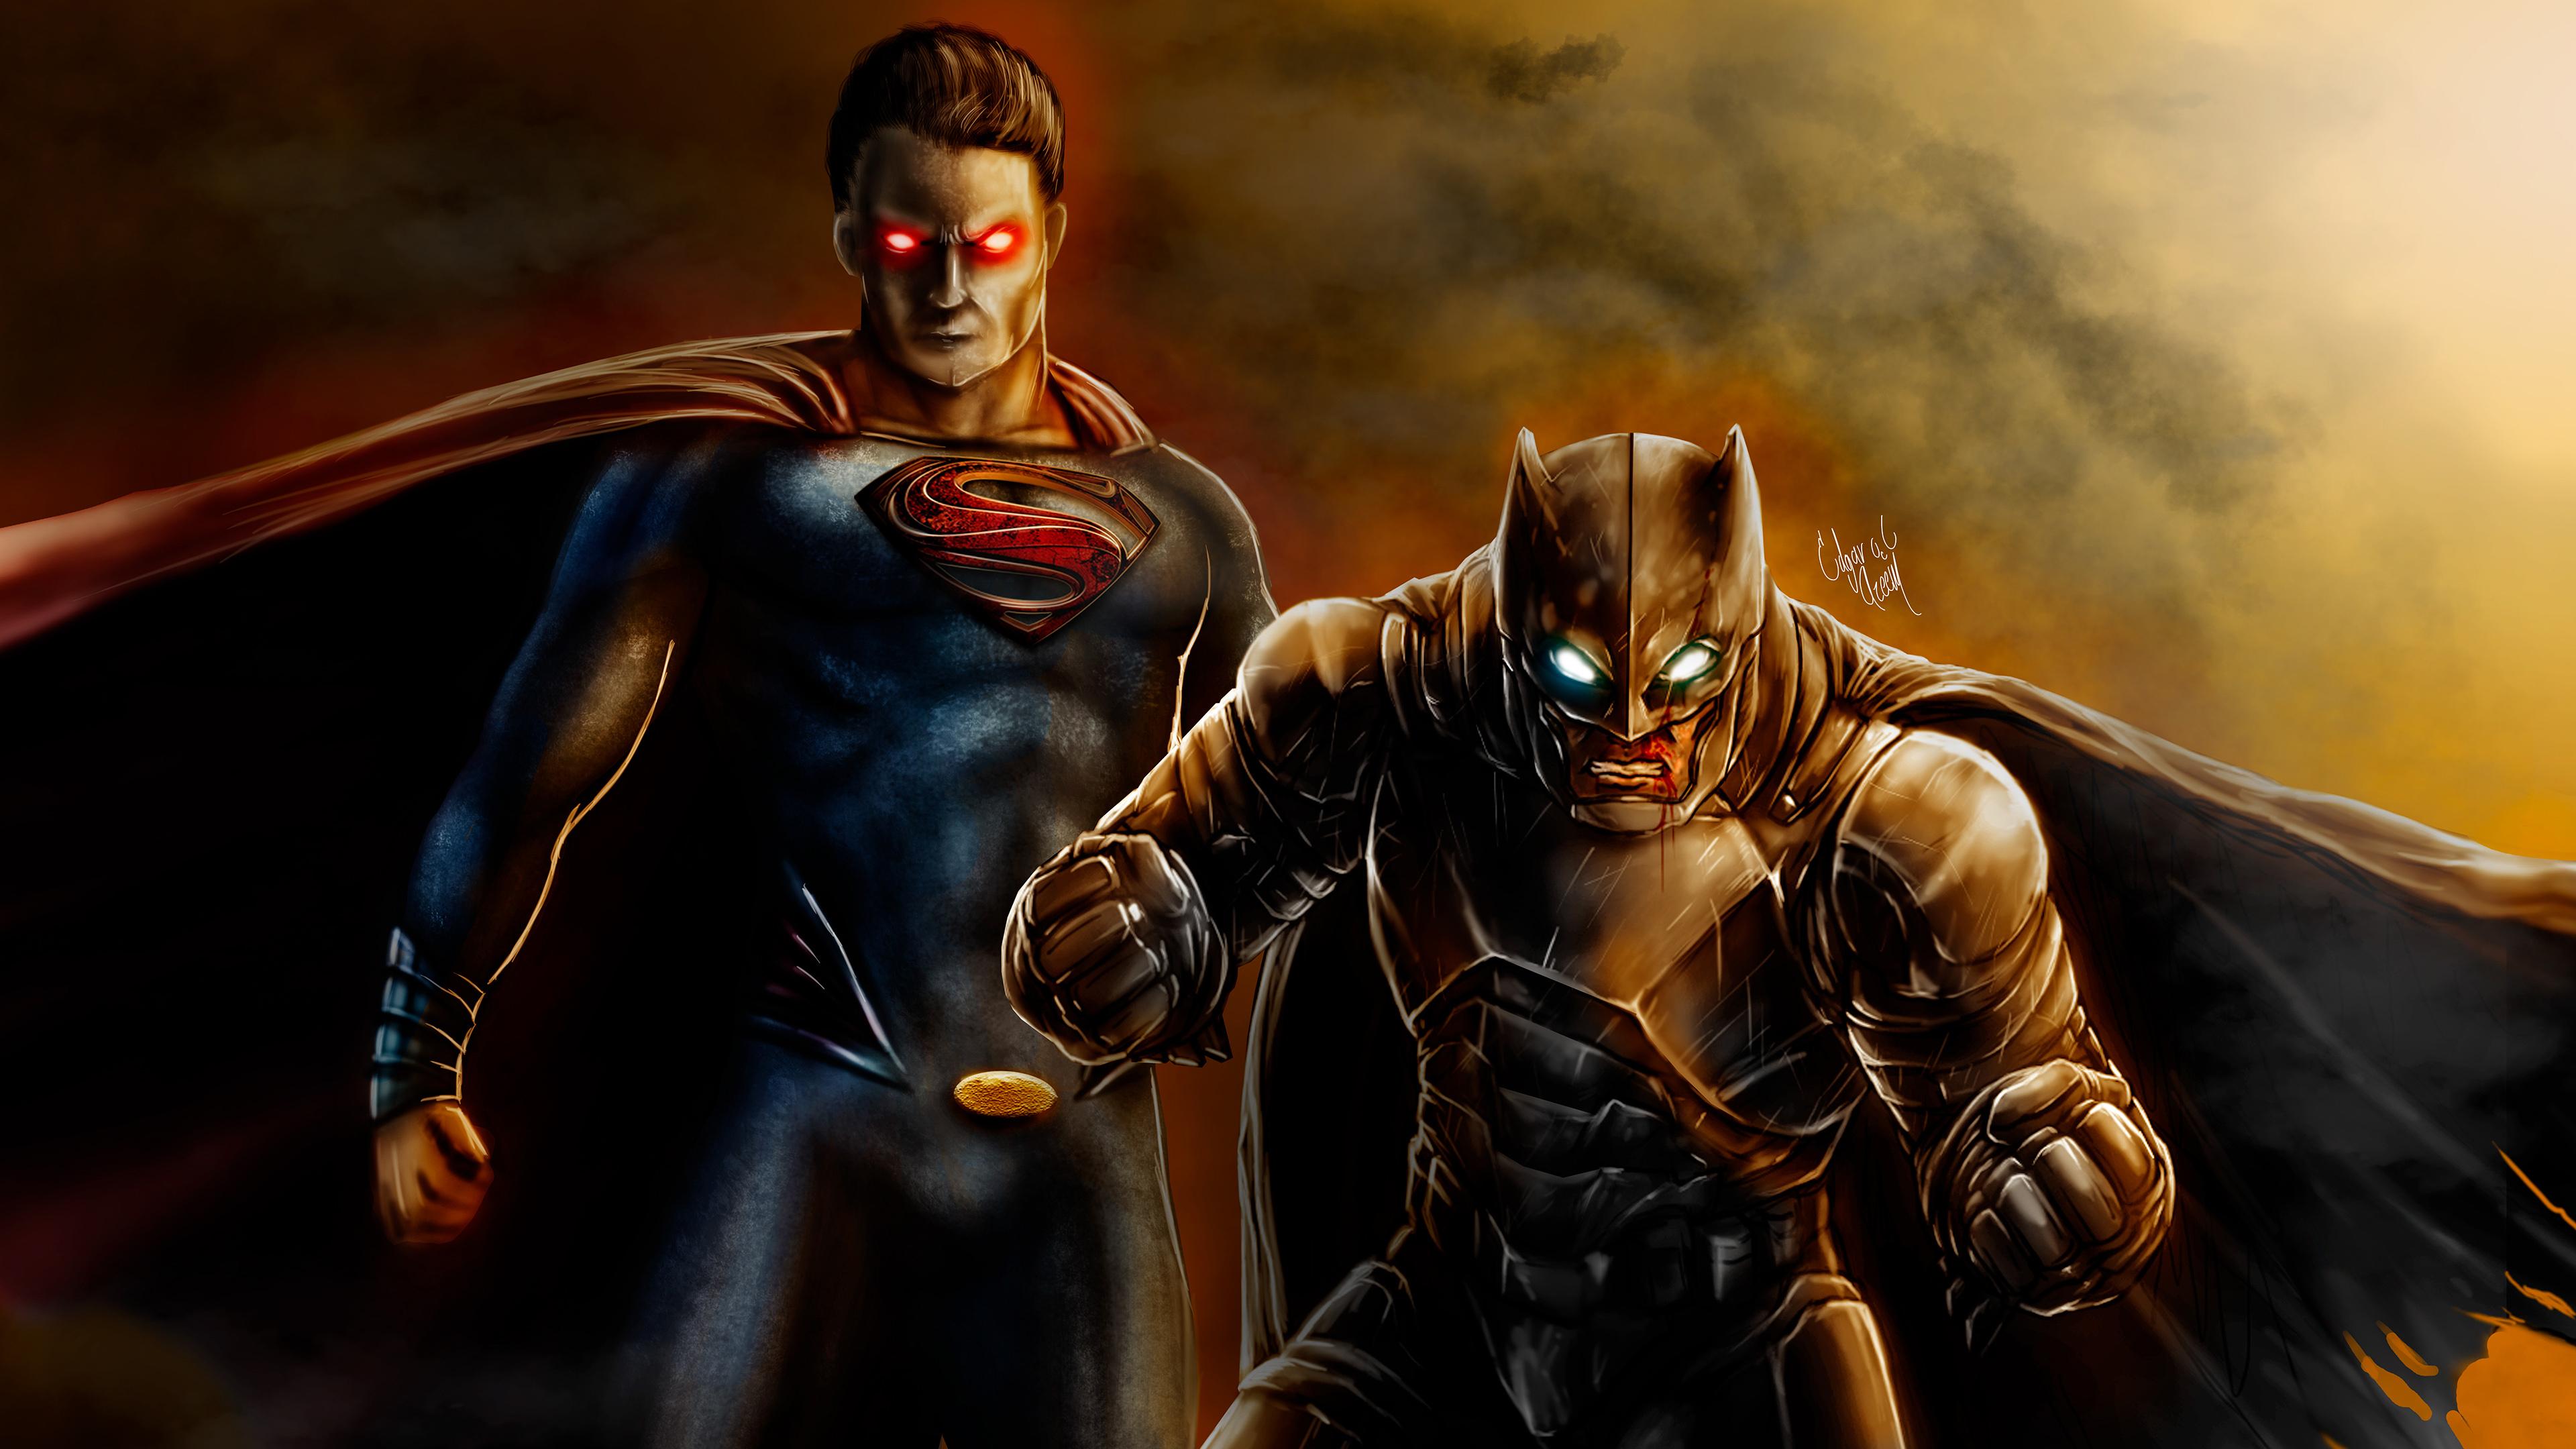 batman superman 4k 1543620271 - Batman Superman 4k - superman wallpapers, superheroes wallpapers, hd-wallpapers, digital art wallpapers, behance wallpapers, batman wallpapers, artwork wallpapers, 4k-wallpapers